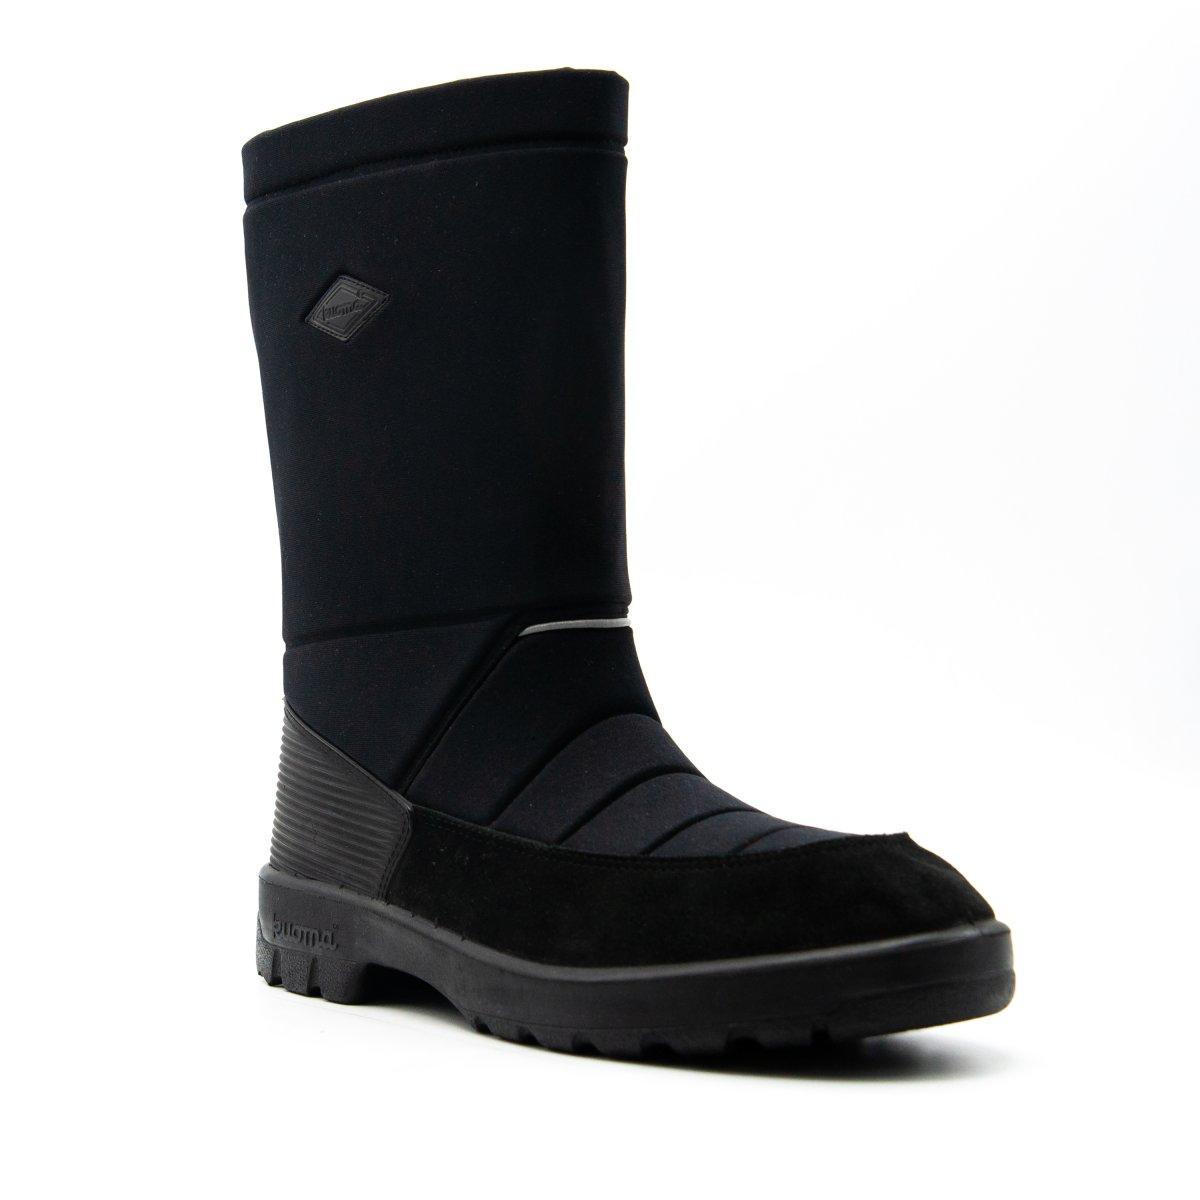 Обувь взрослая Kuoma Pallas, Black